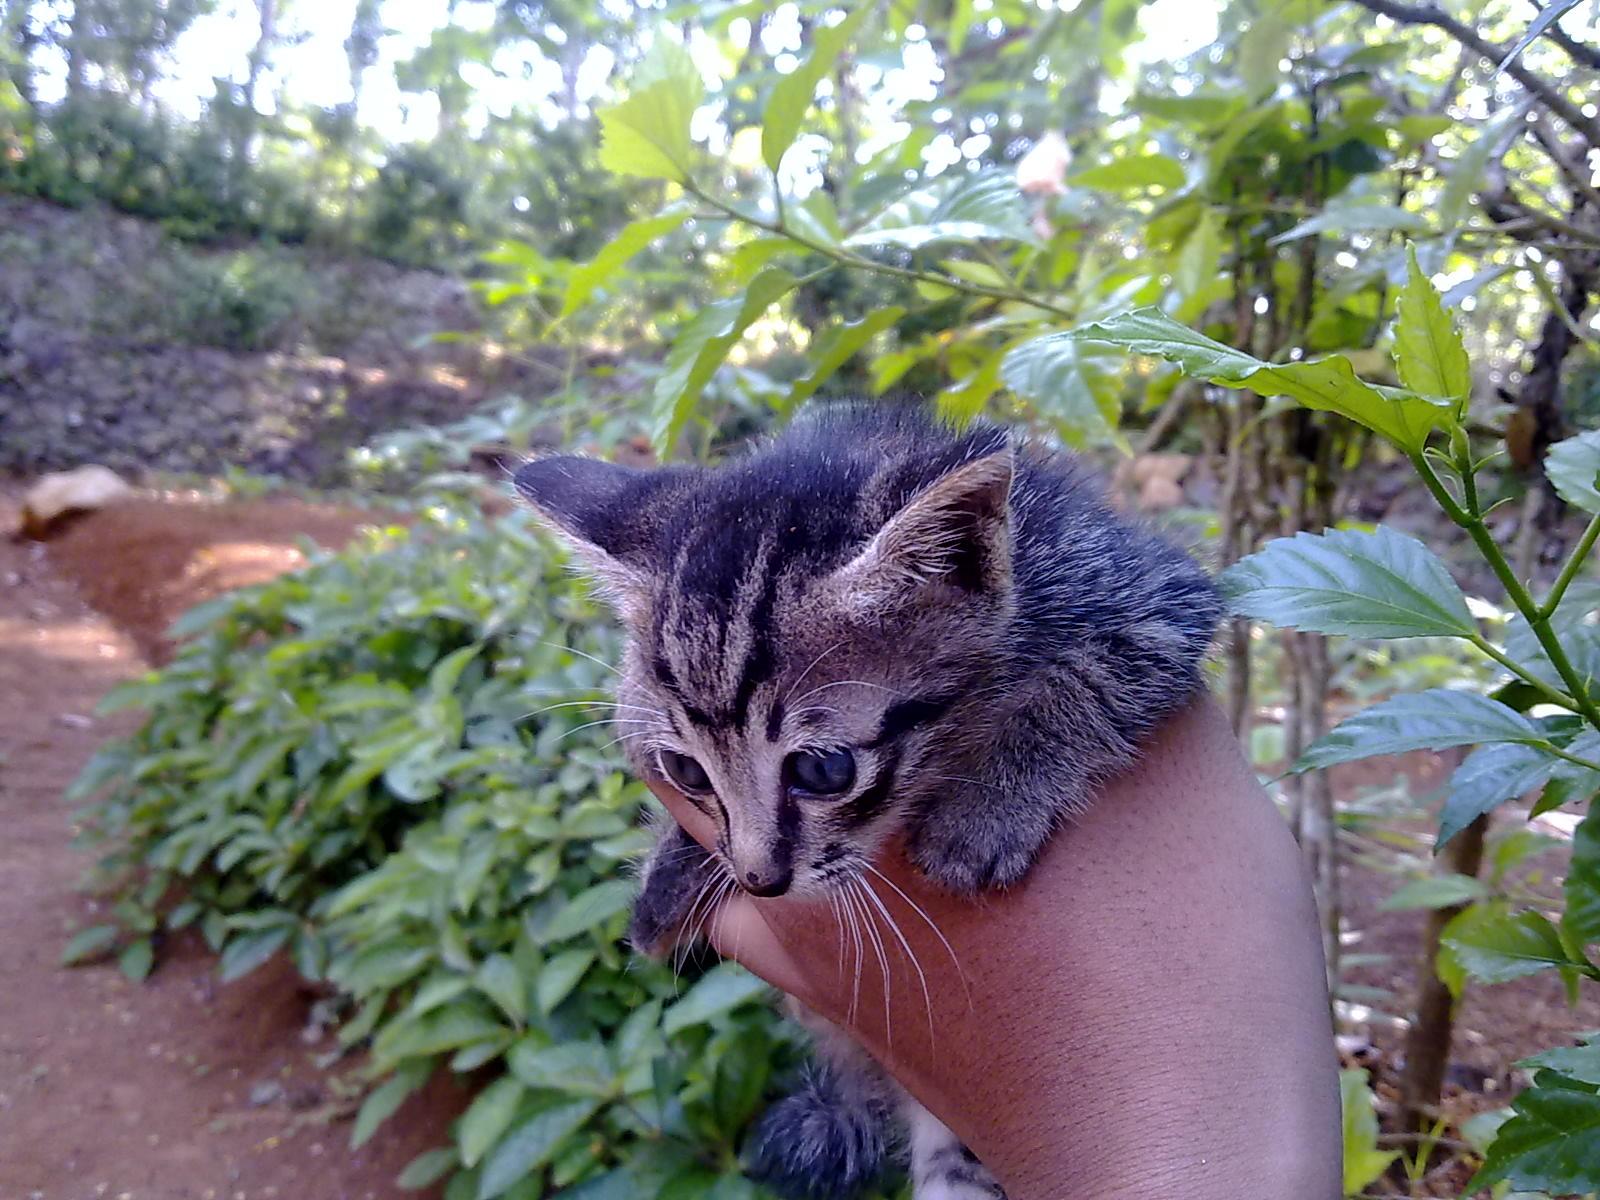 Sekian dulu foto tentang kucing, tunggu foto-foto lainnya